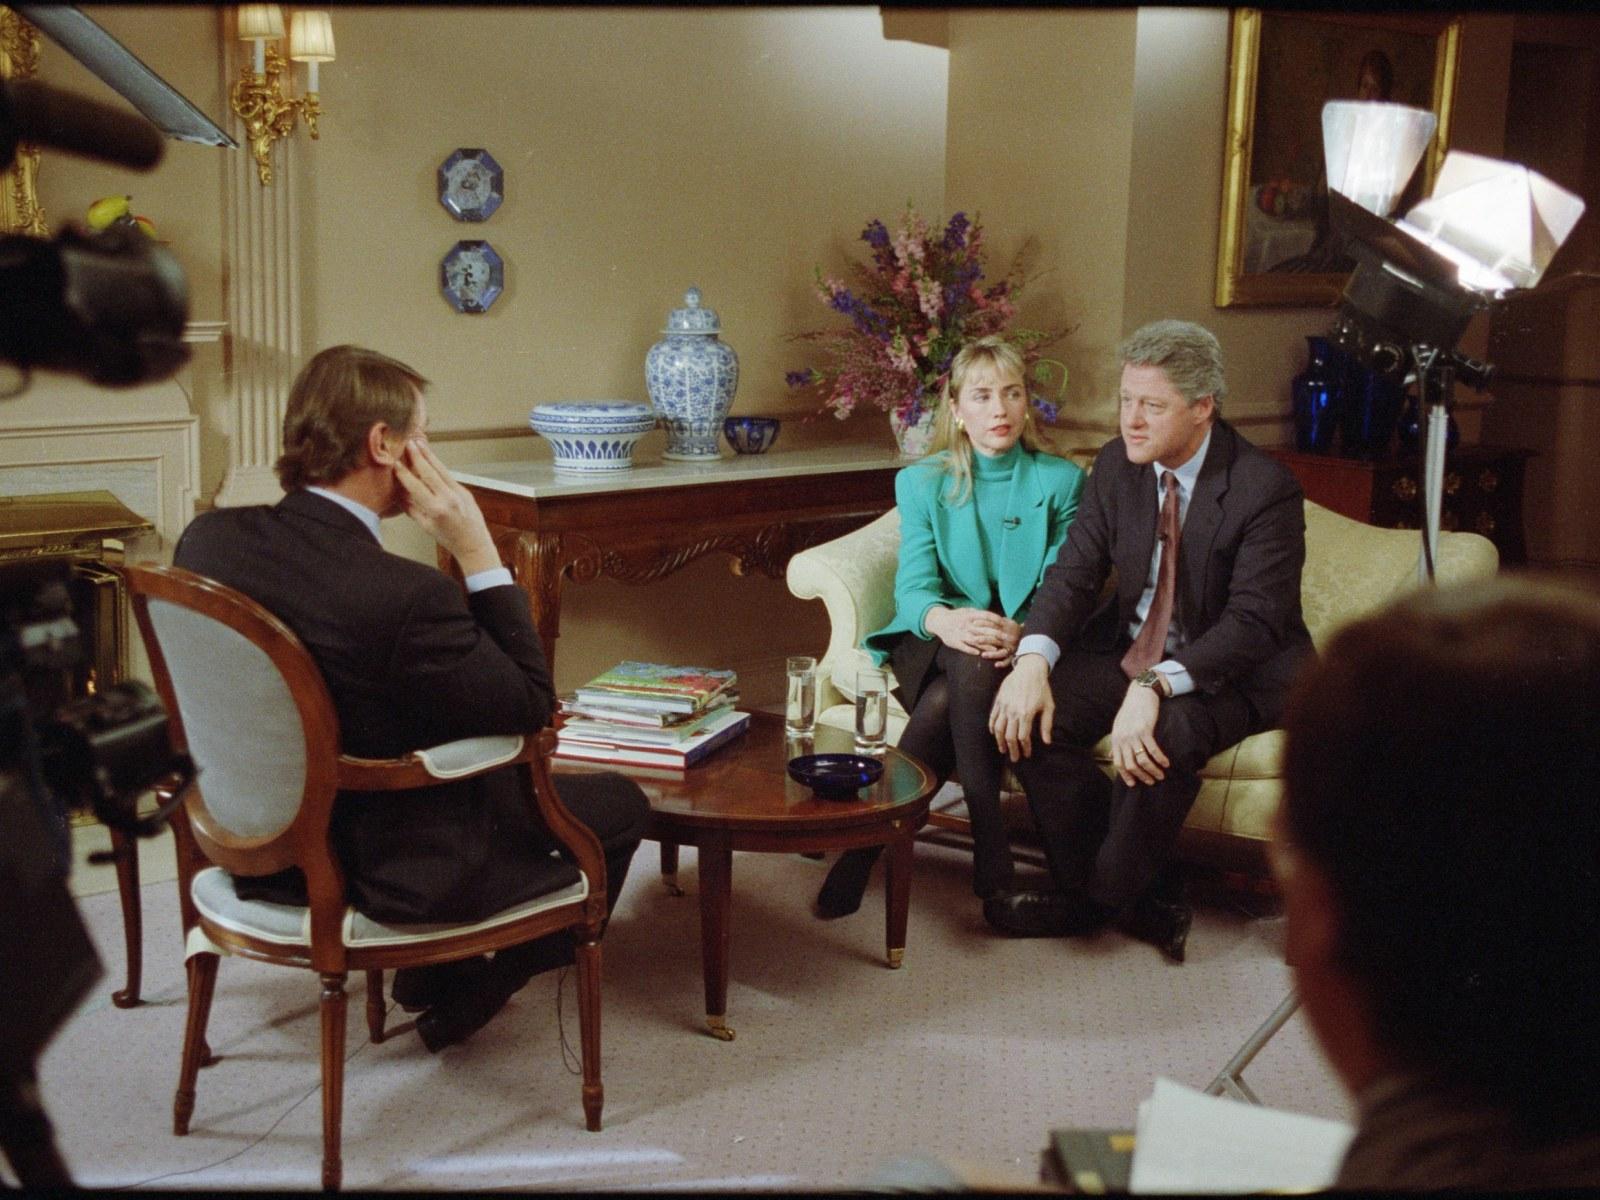 Before Trump Was President, Online Sex Videos, Bill Clinton